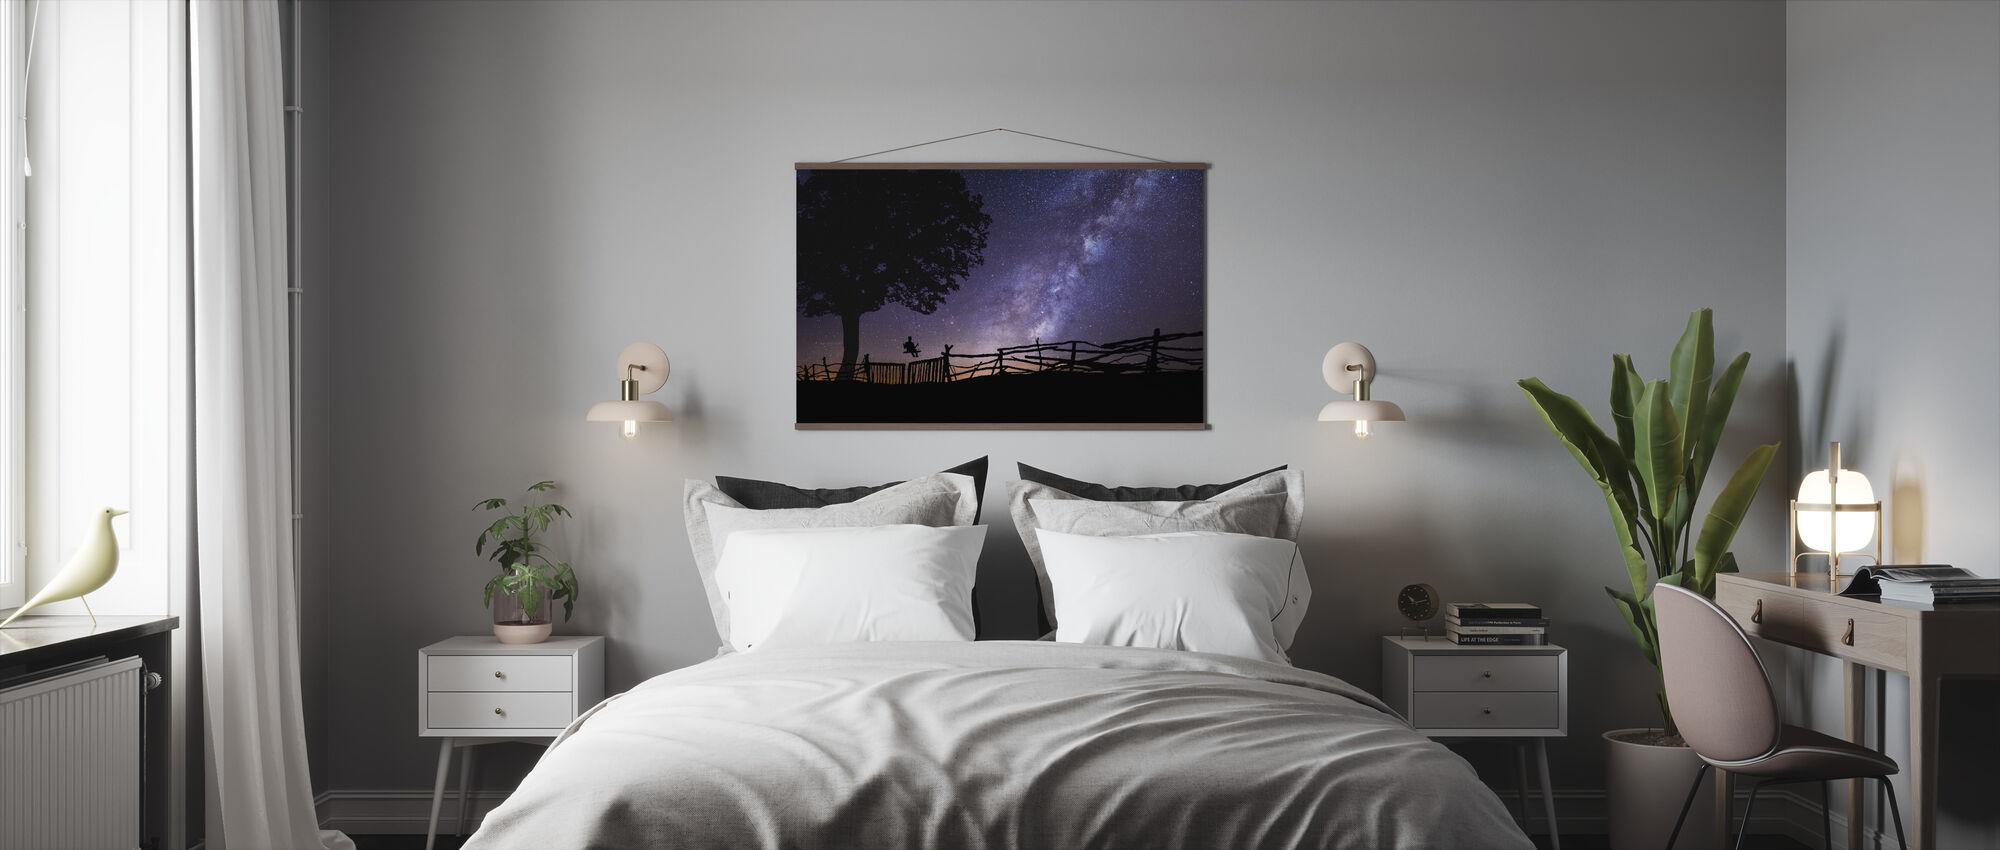 Starry Night Sky - Poster - Bedroom